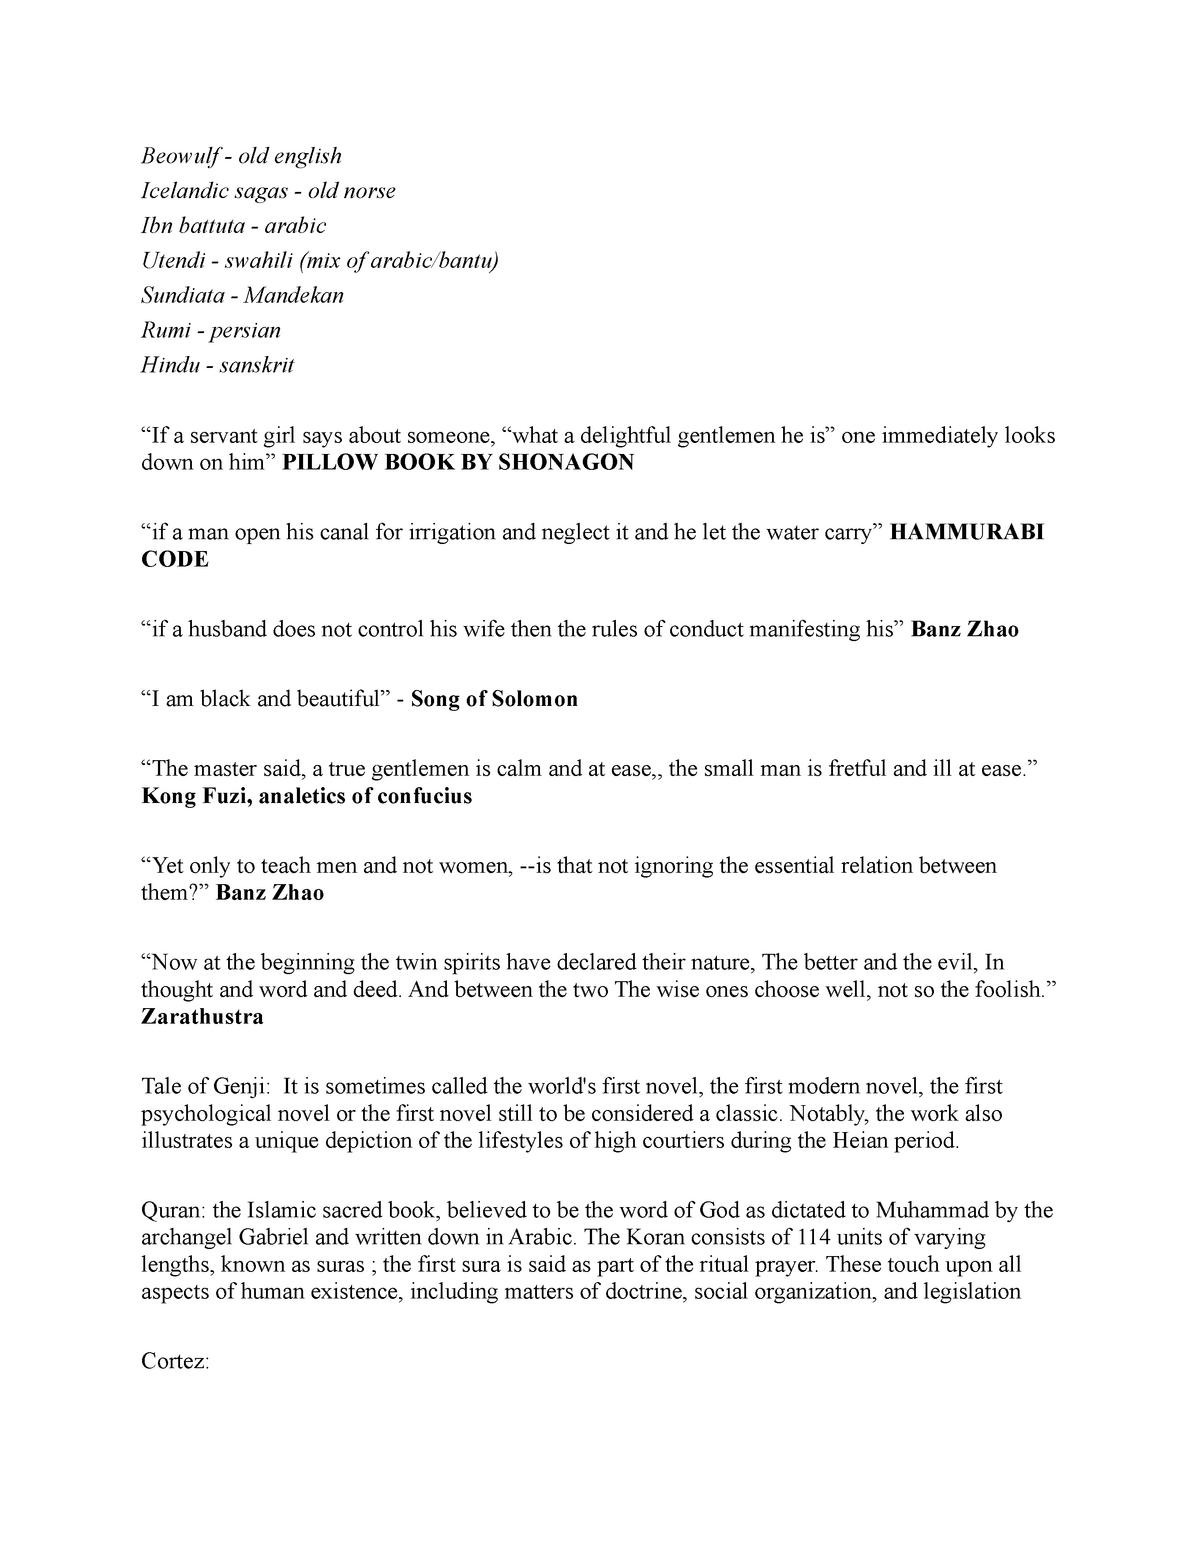 Final Exam Review - HIST 208: World History I - StuDocu